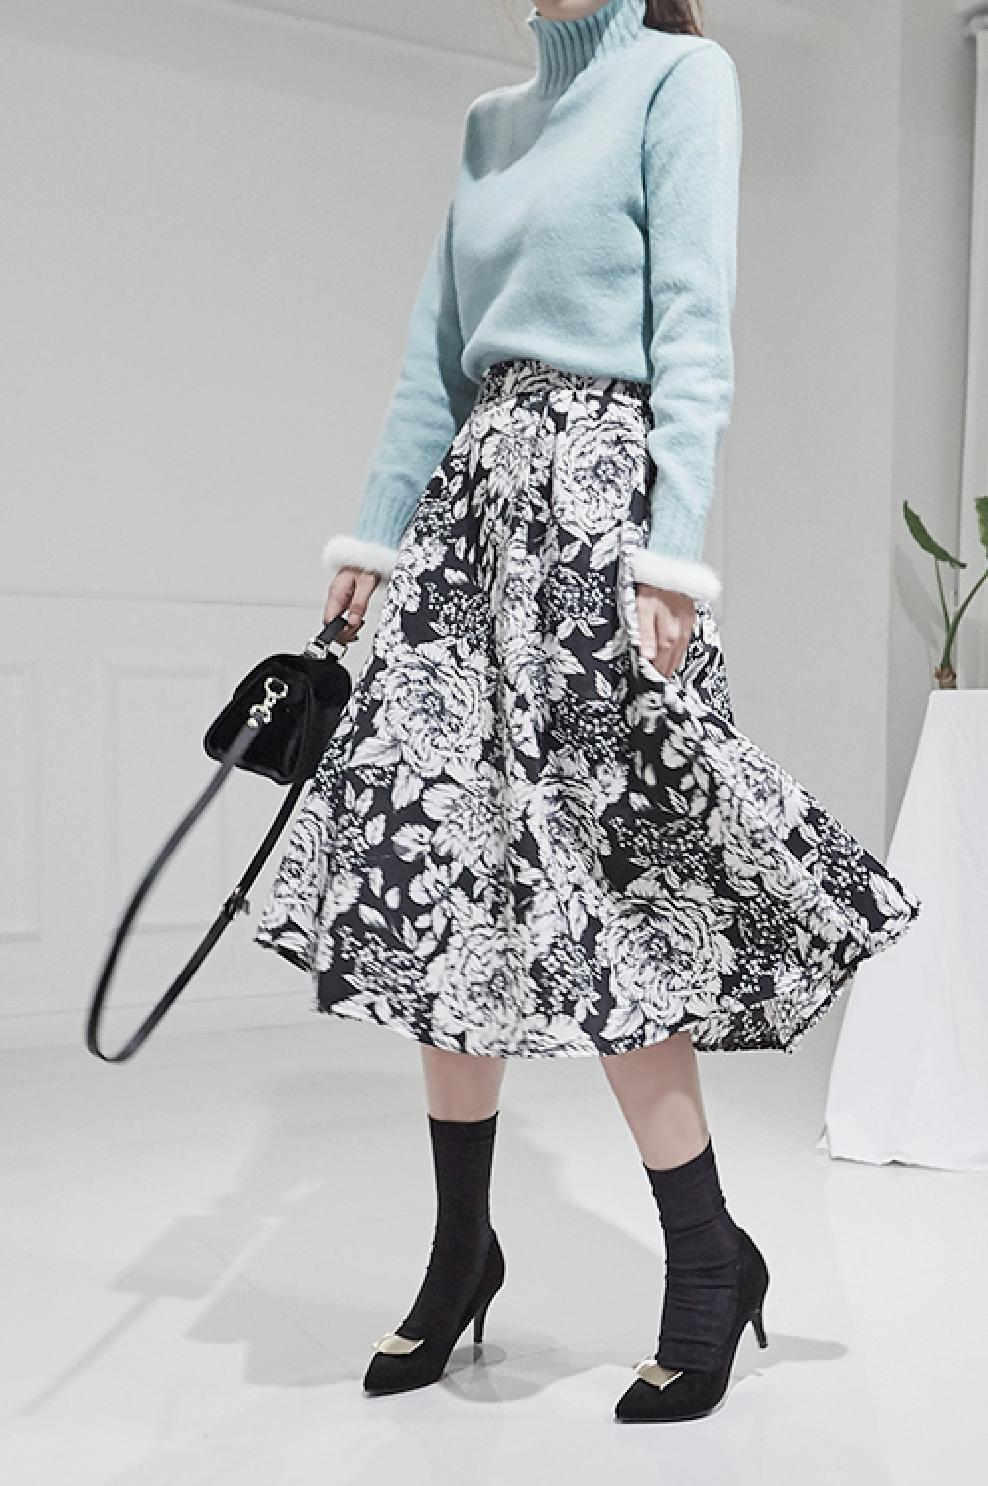 BlancJo fashion photography